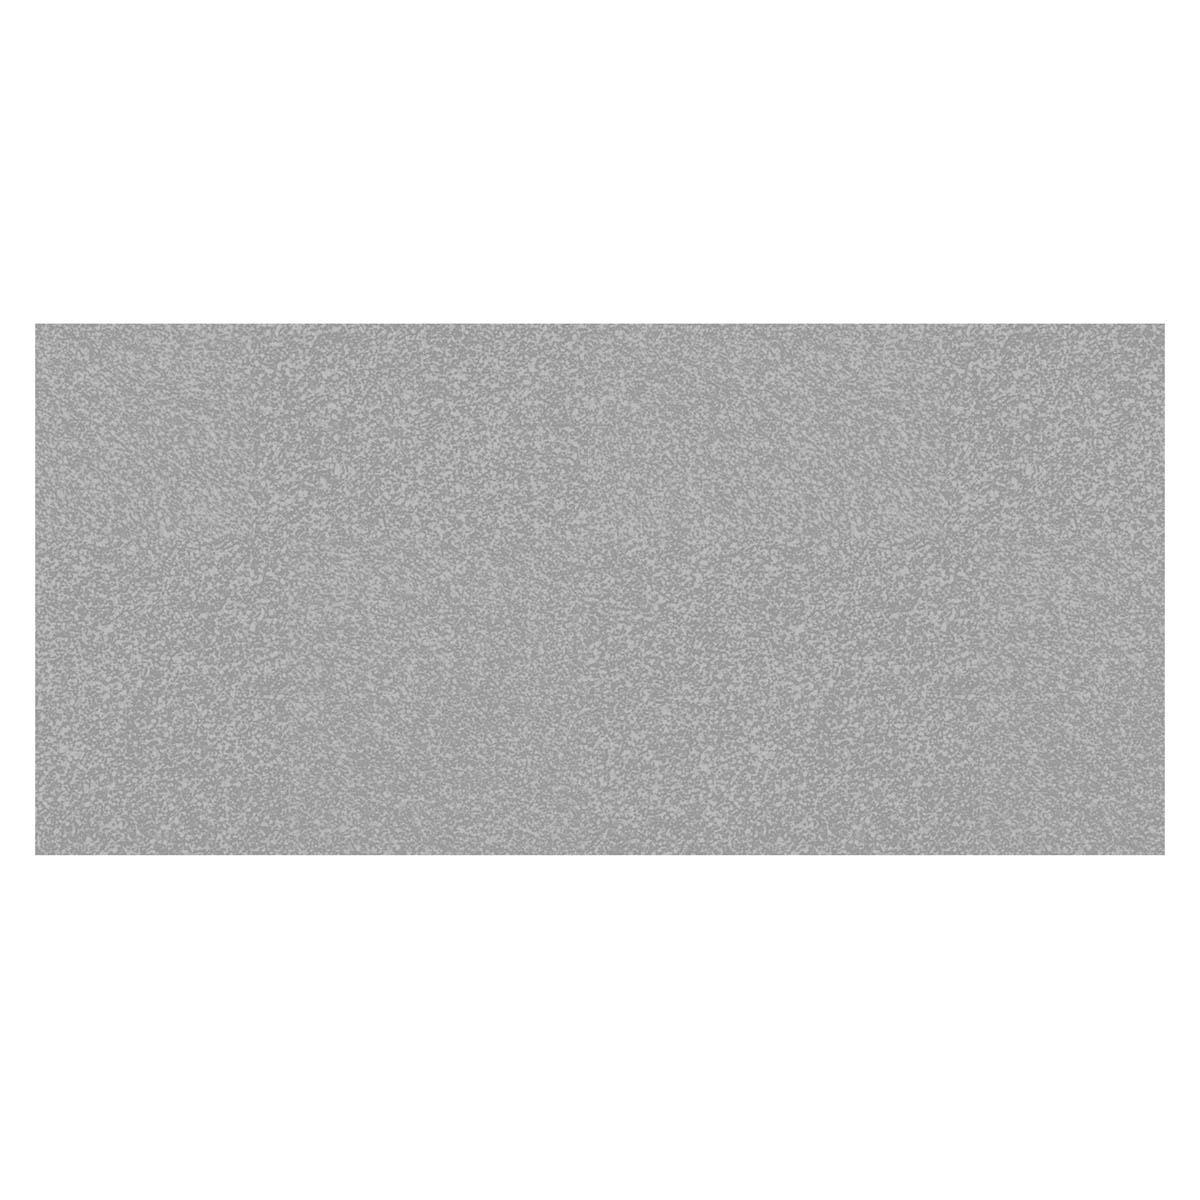 Waverly ® Inspirations Glitter Multi-Surface Acrylic Paint - Silver, 2 oz.